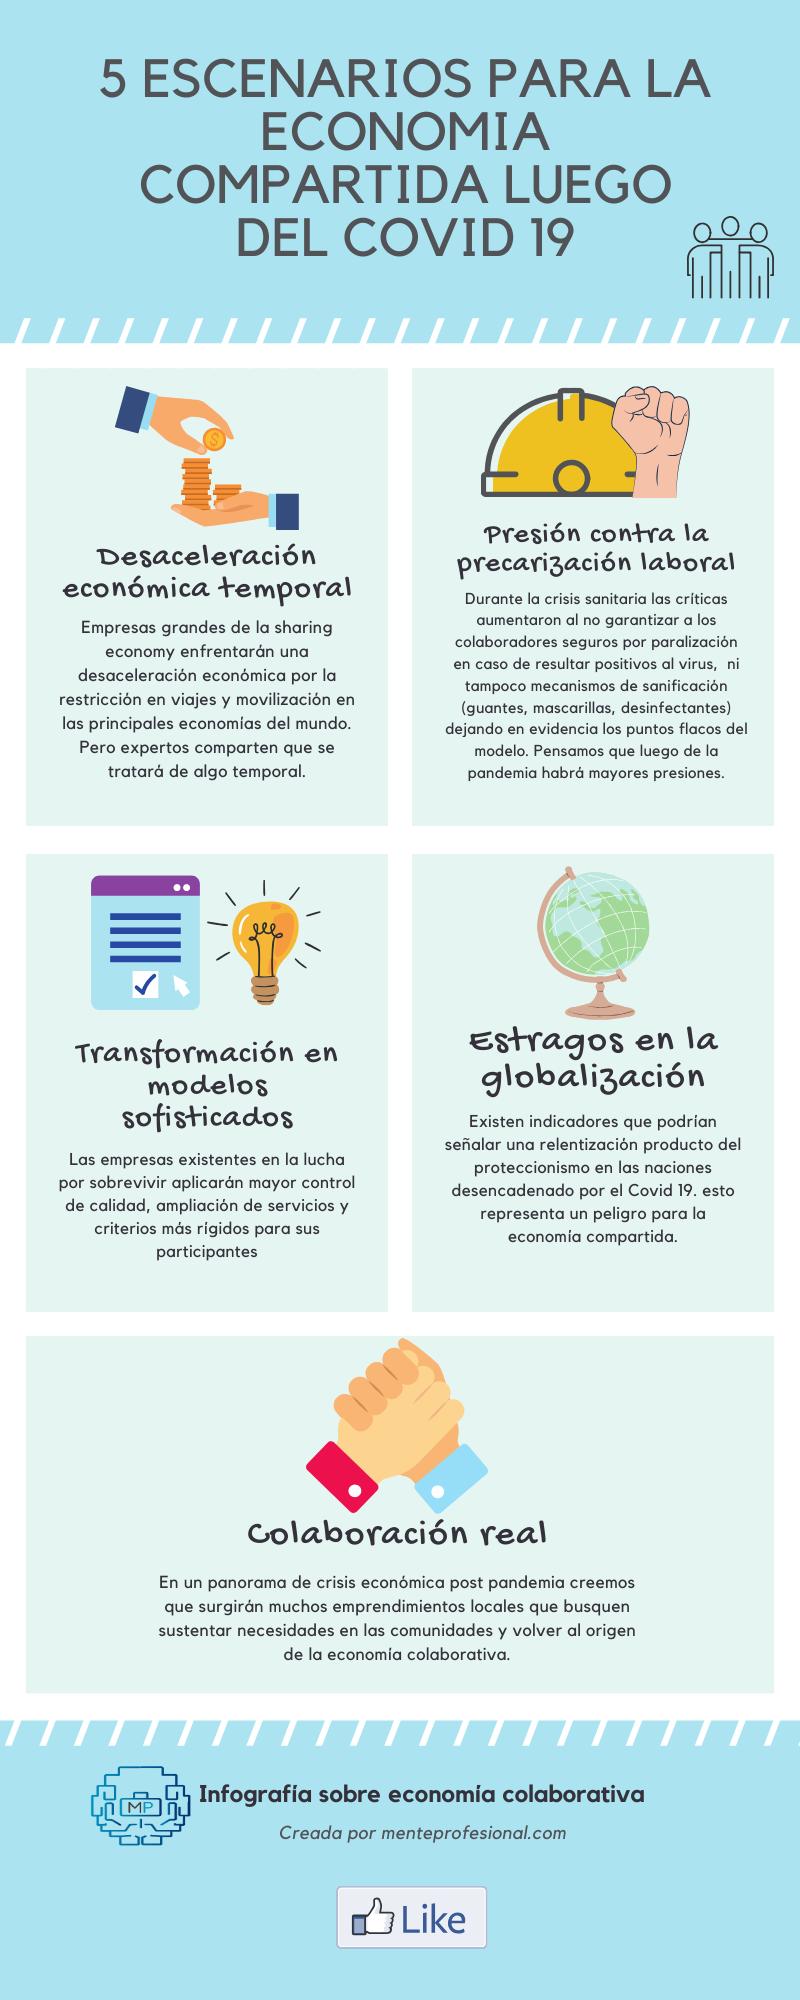 5 escenarios para la Economía Colaborativa post Covid19 #infografia #infographic